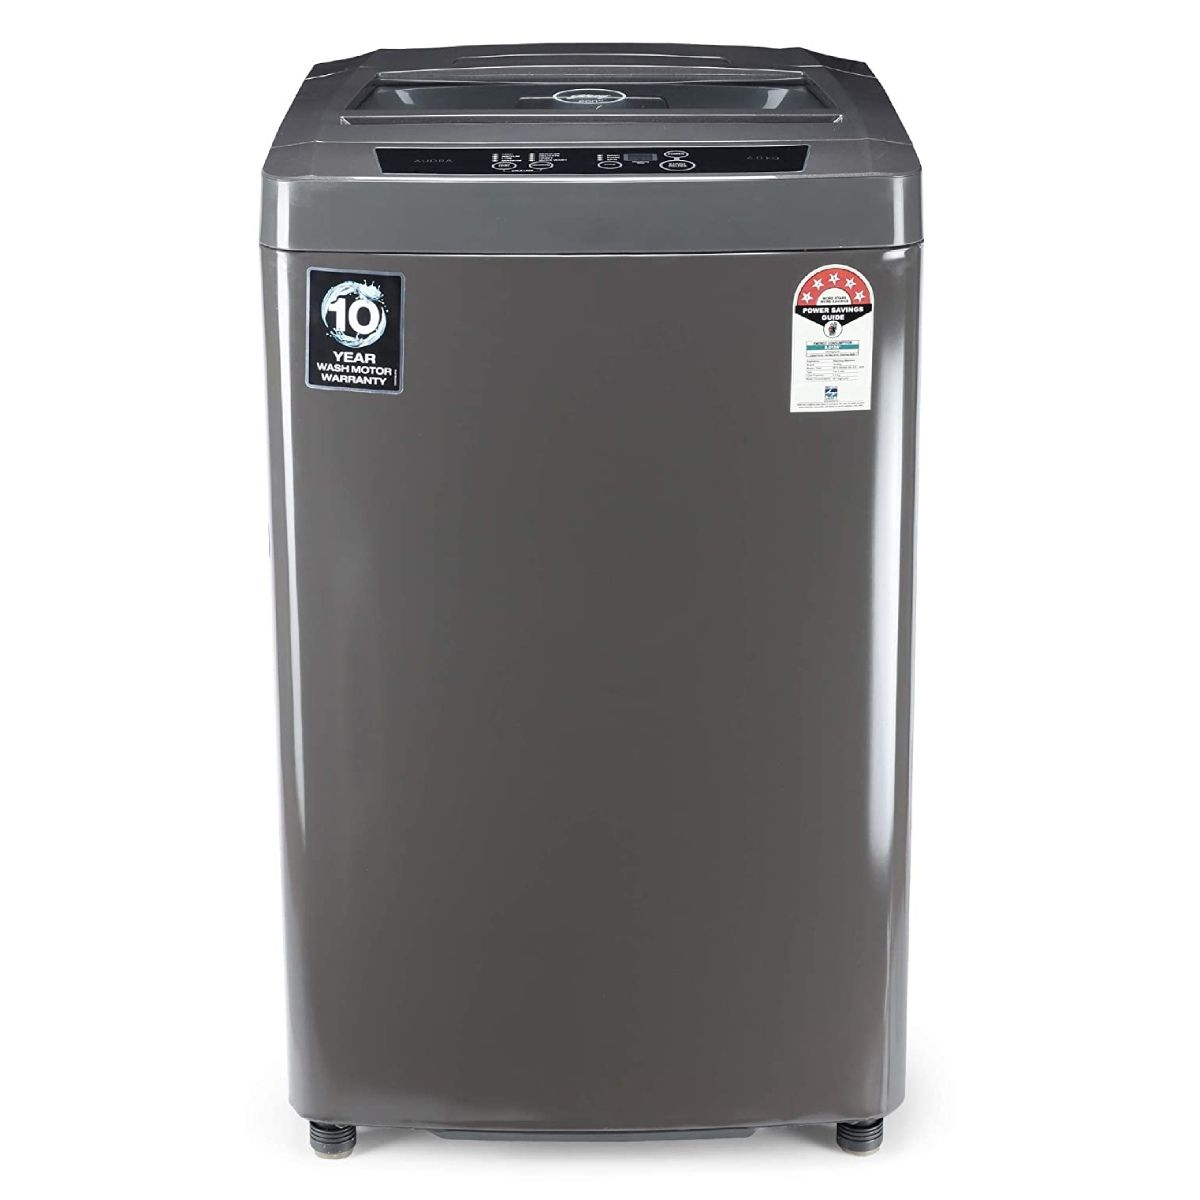 Godrej 6 Kg 5 Star Fully-Automatic Top Loading Washing Machine (WTEON 600 AD 5.0 ROGR)